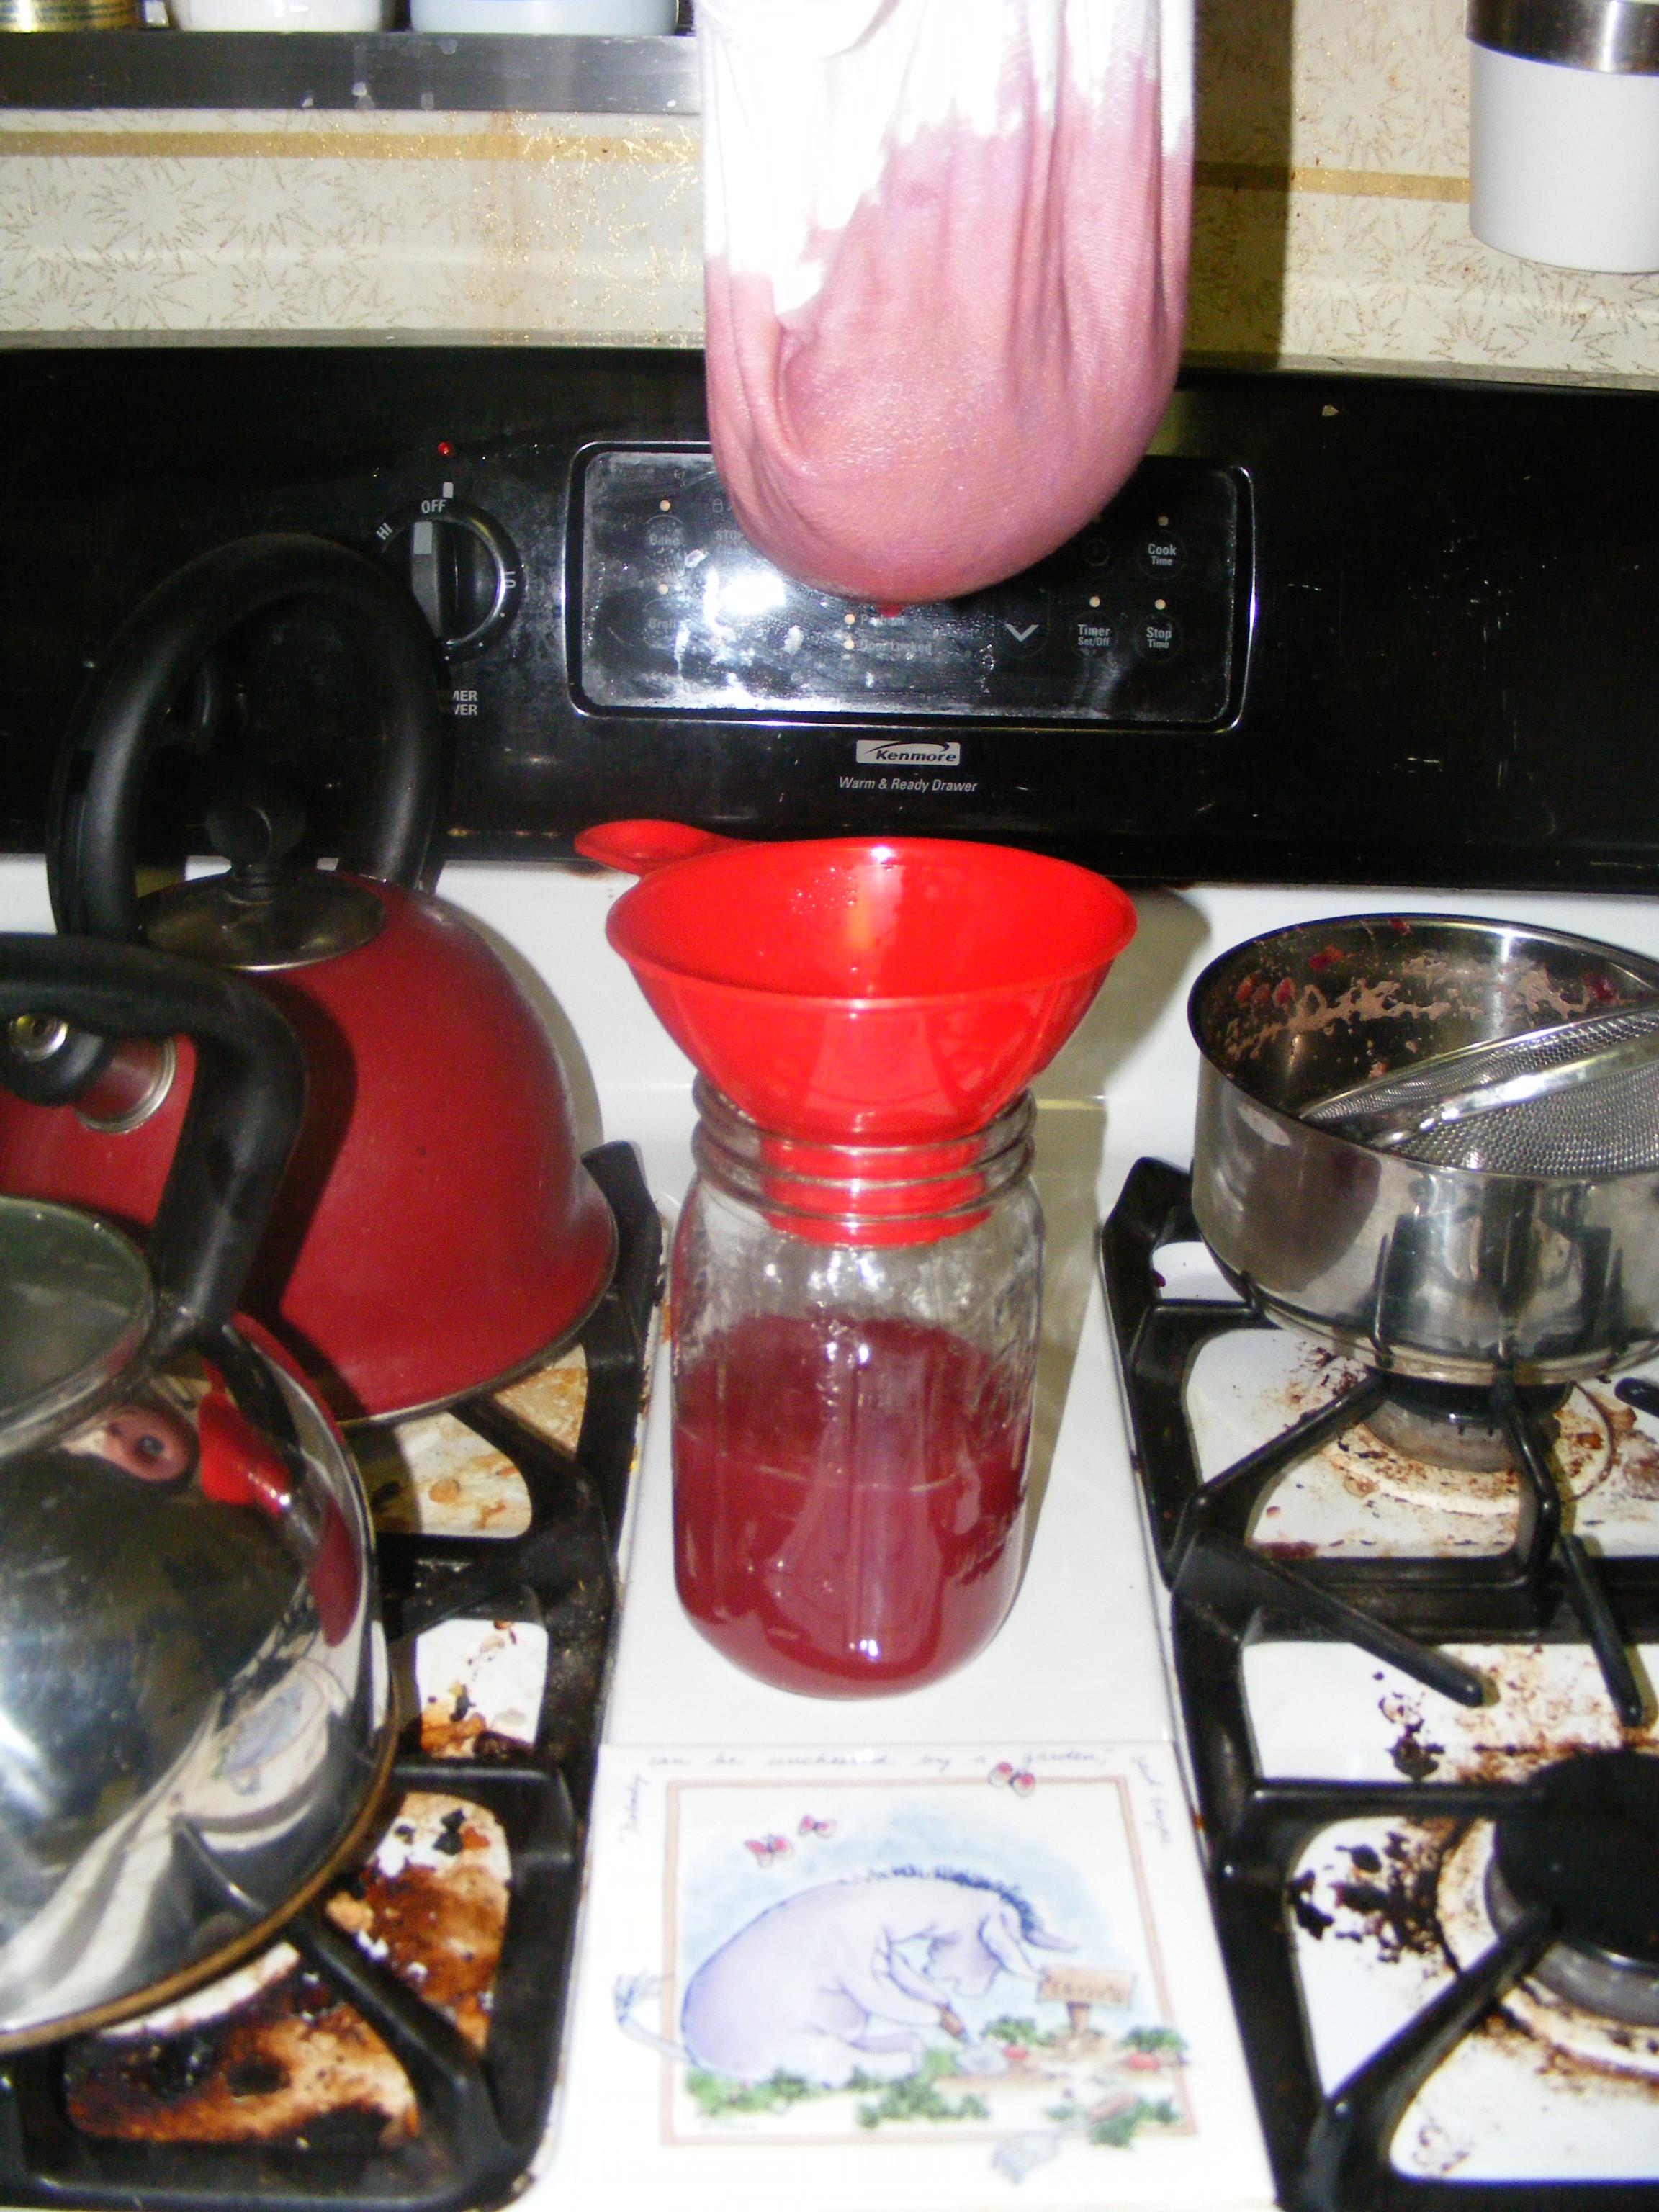 making soda syrup